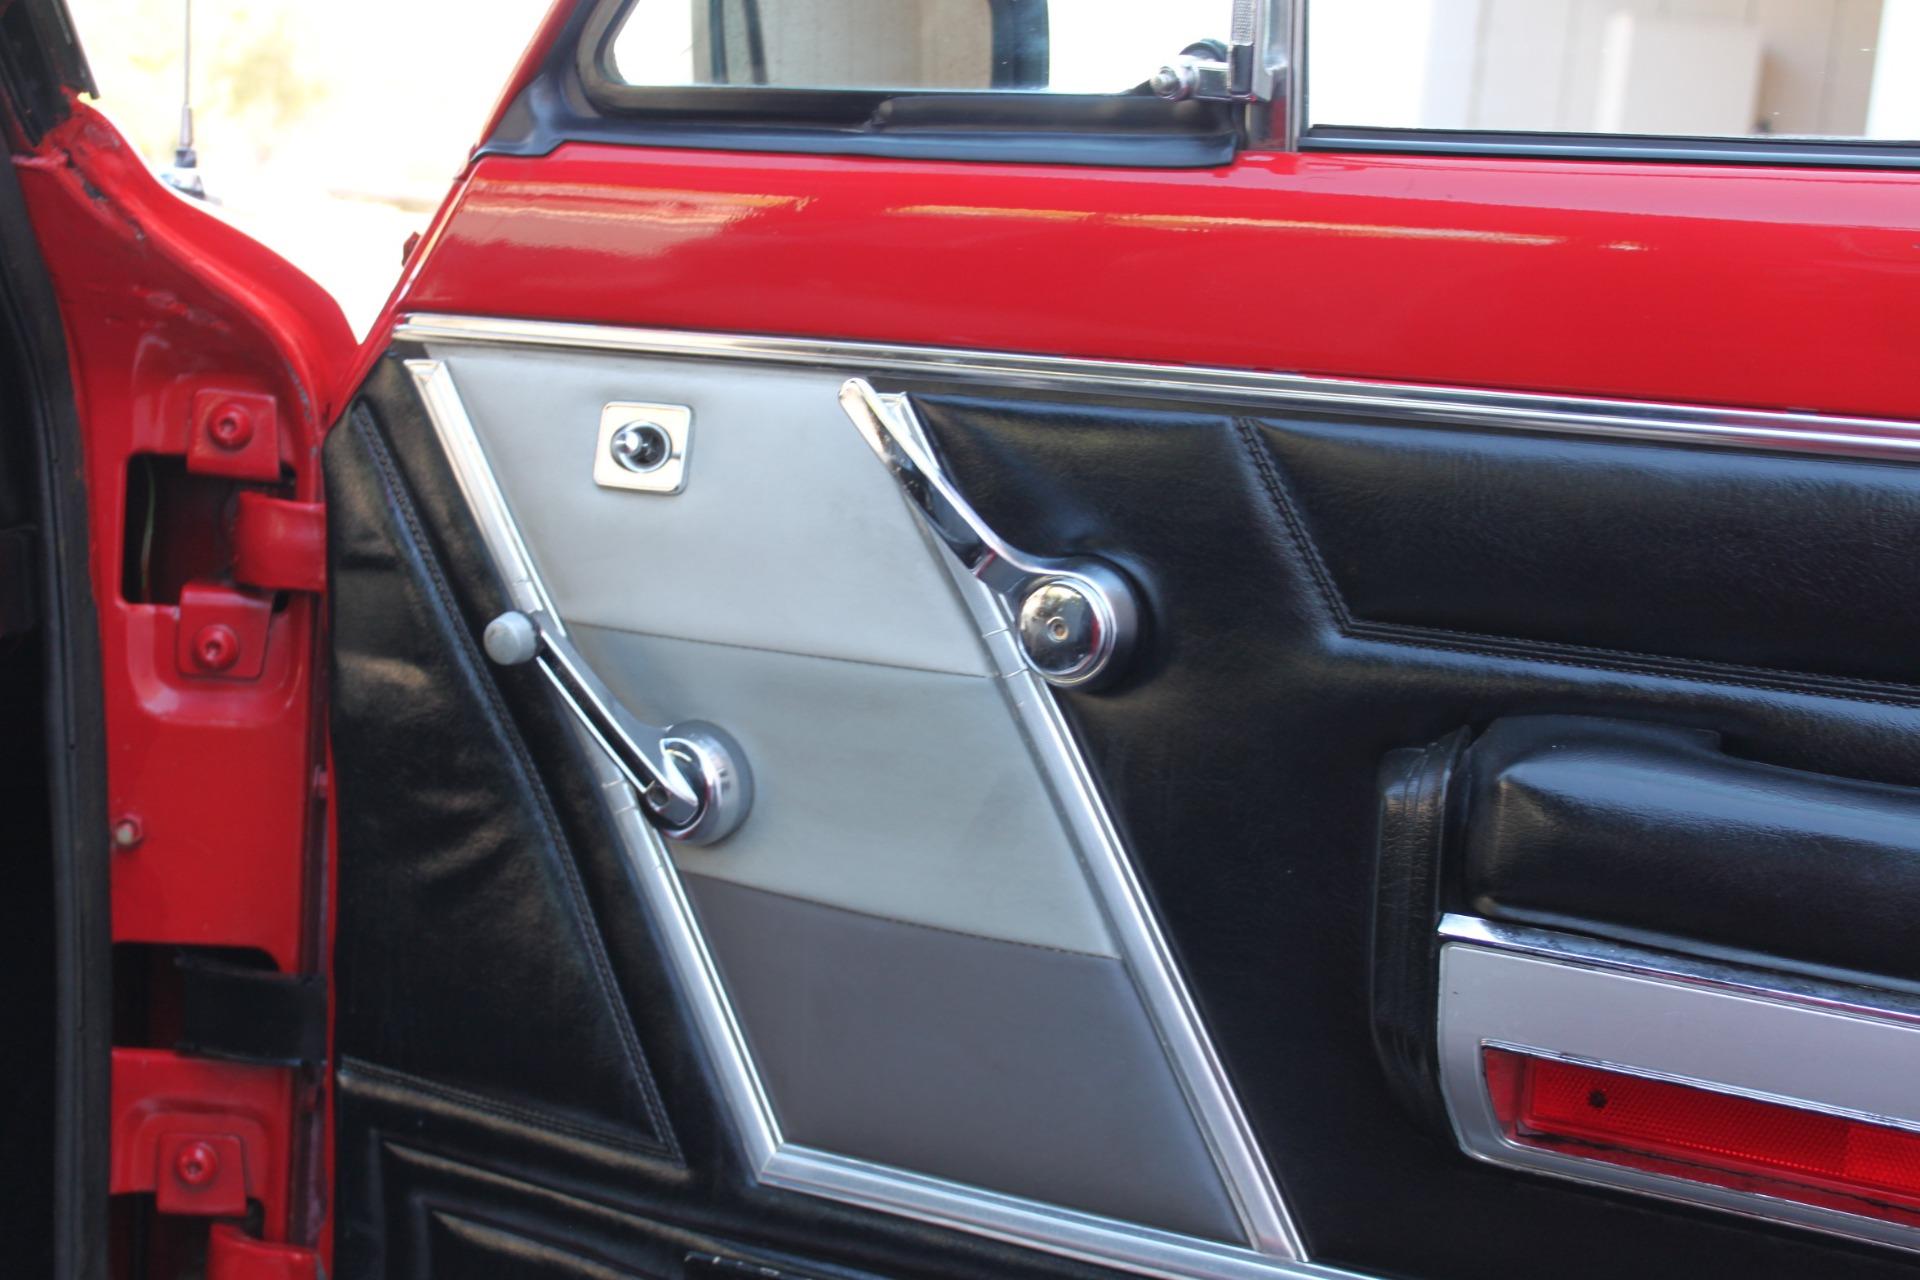 Used-1983-Jeep-Cherokee-Chief-4WD-Lexus